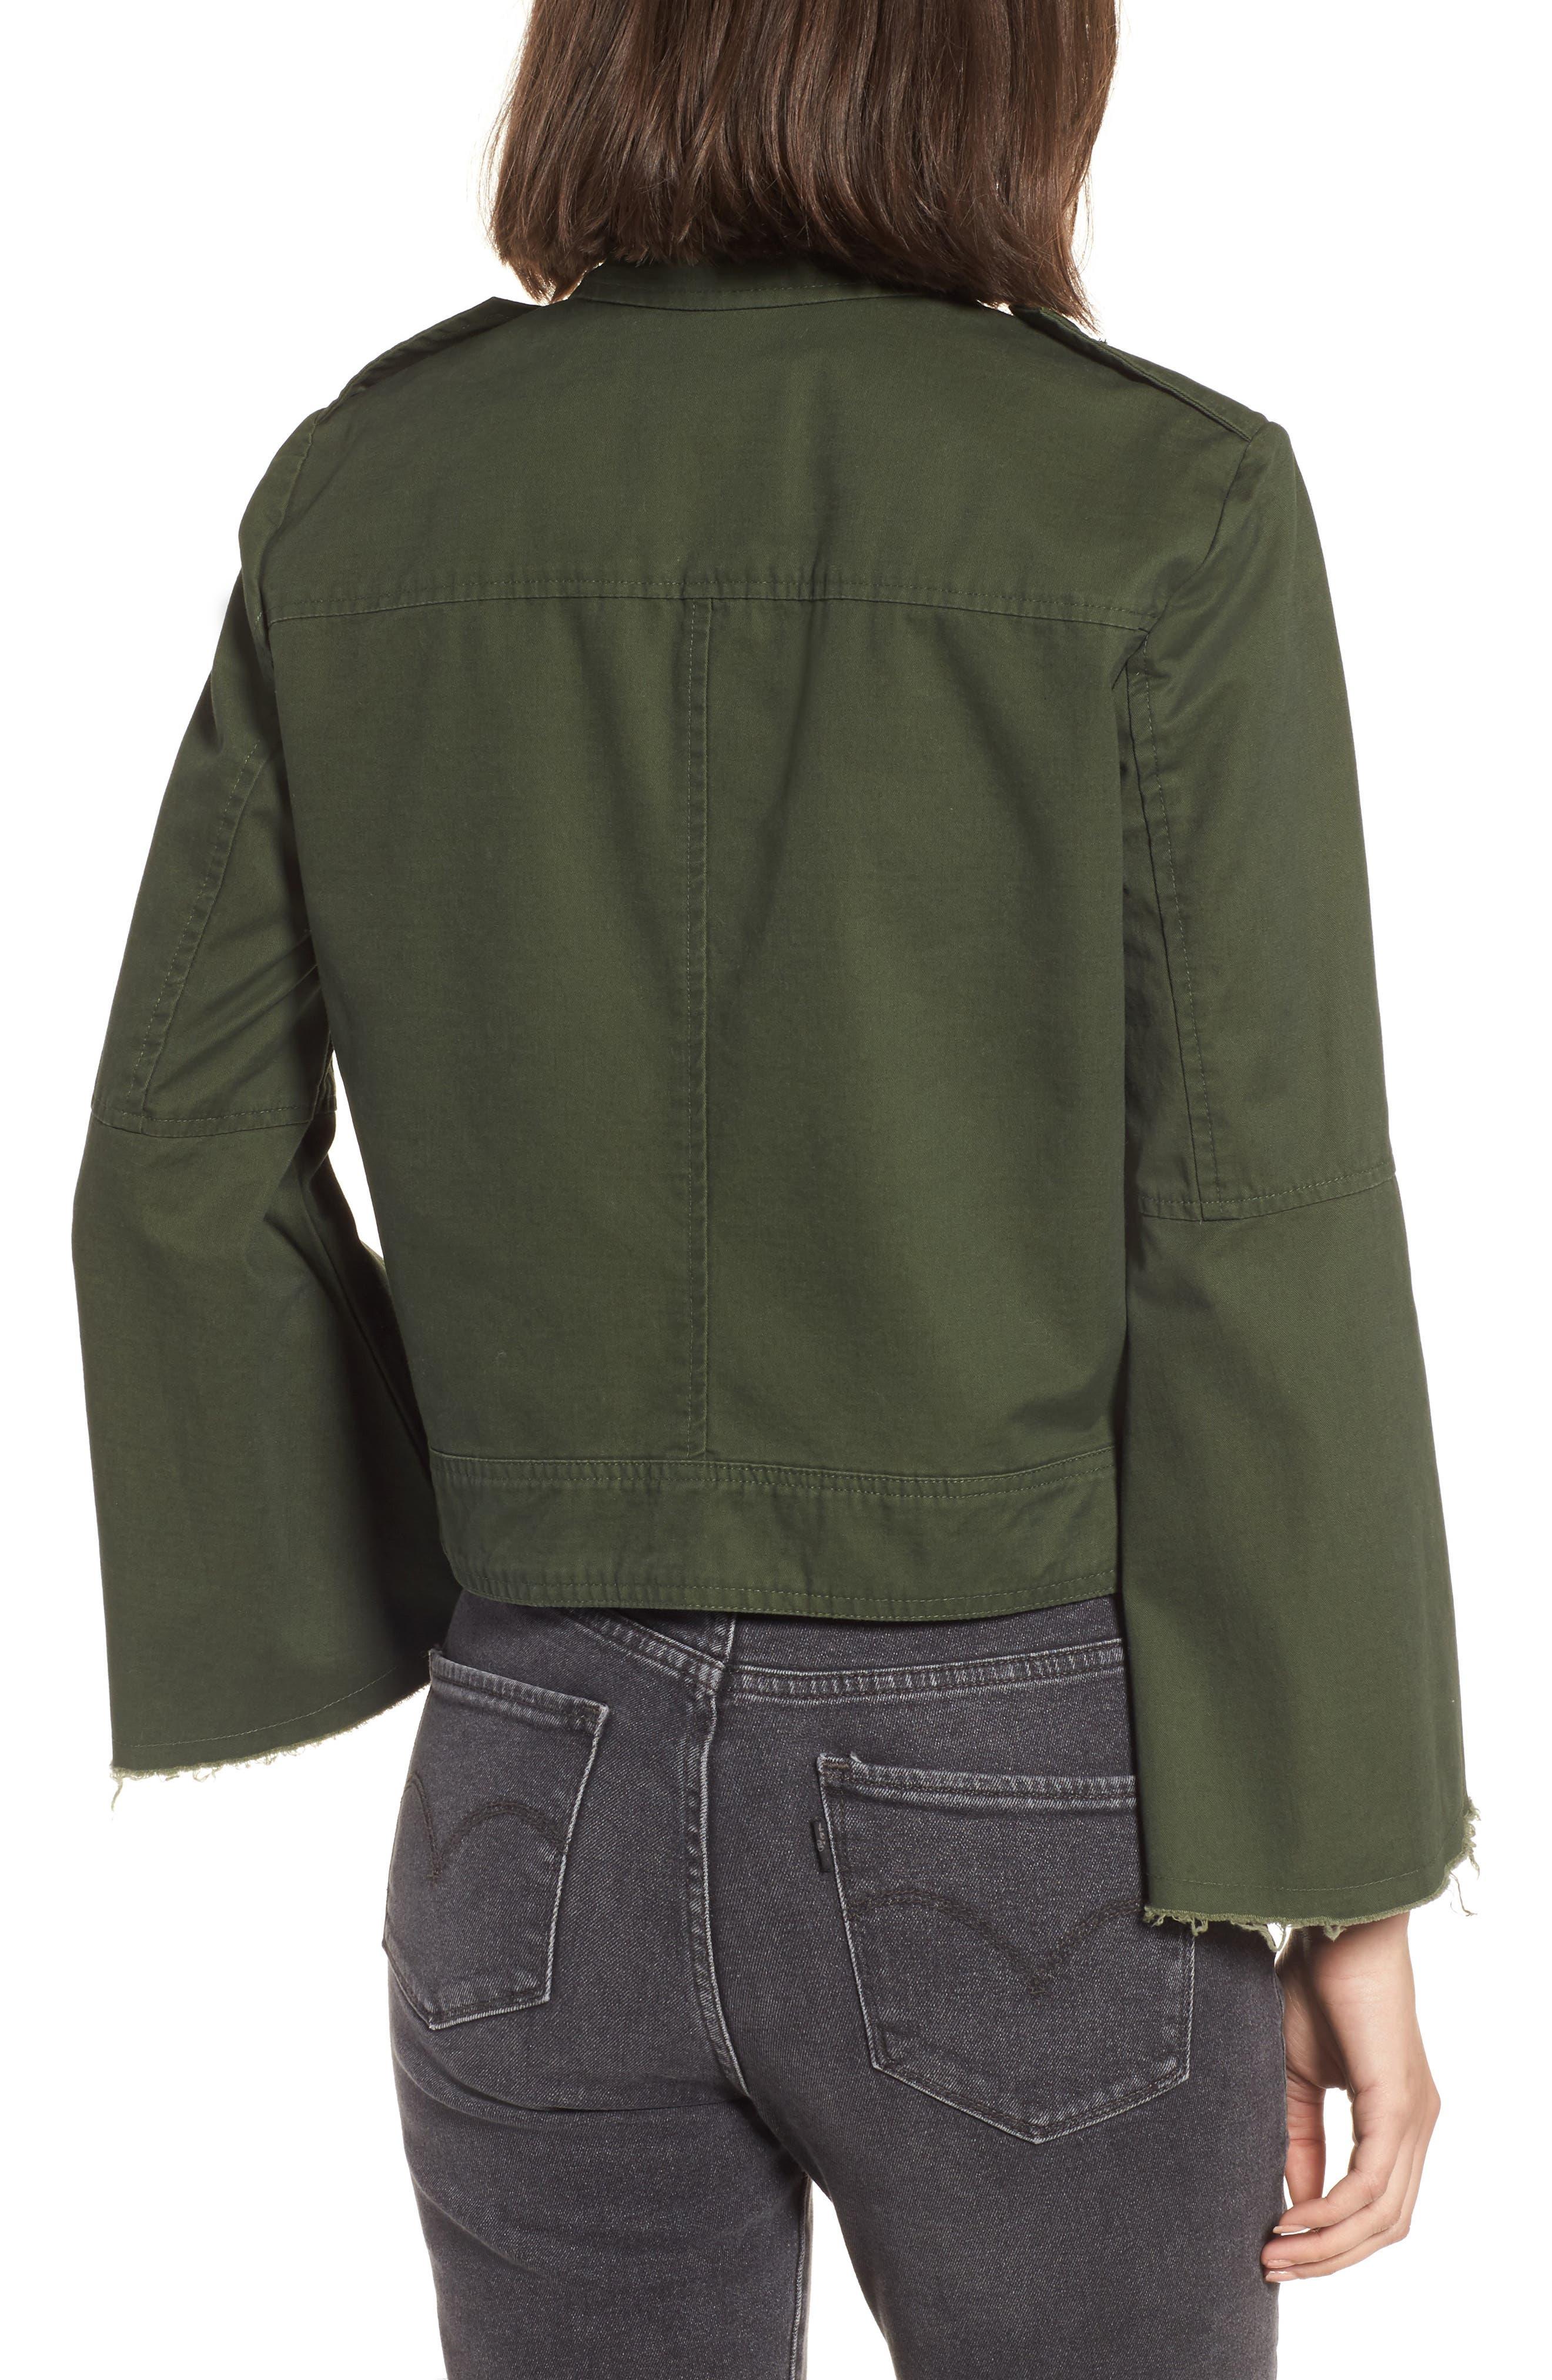 Jennie Cotton Twill Army Jacket,                             Alternate thumbnail 2, color,                             301